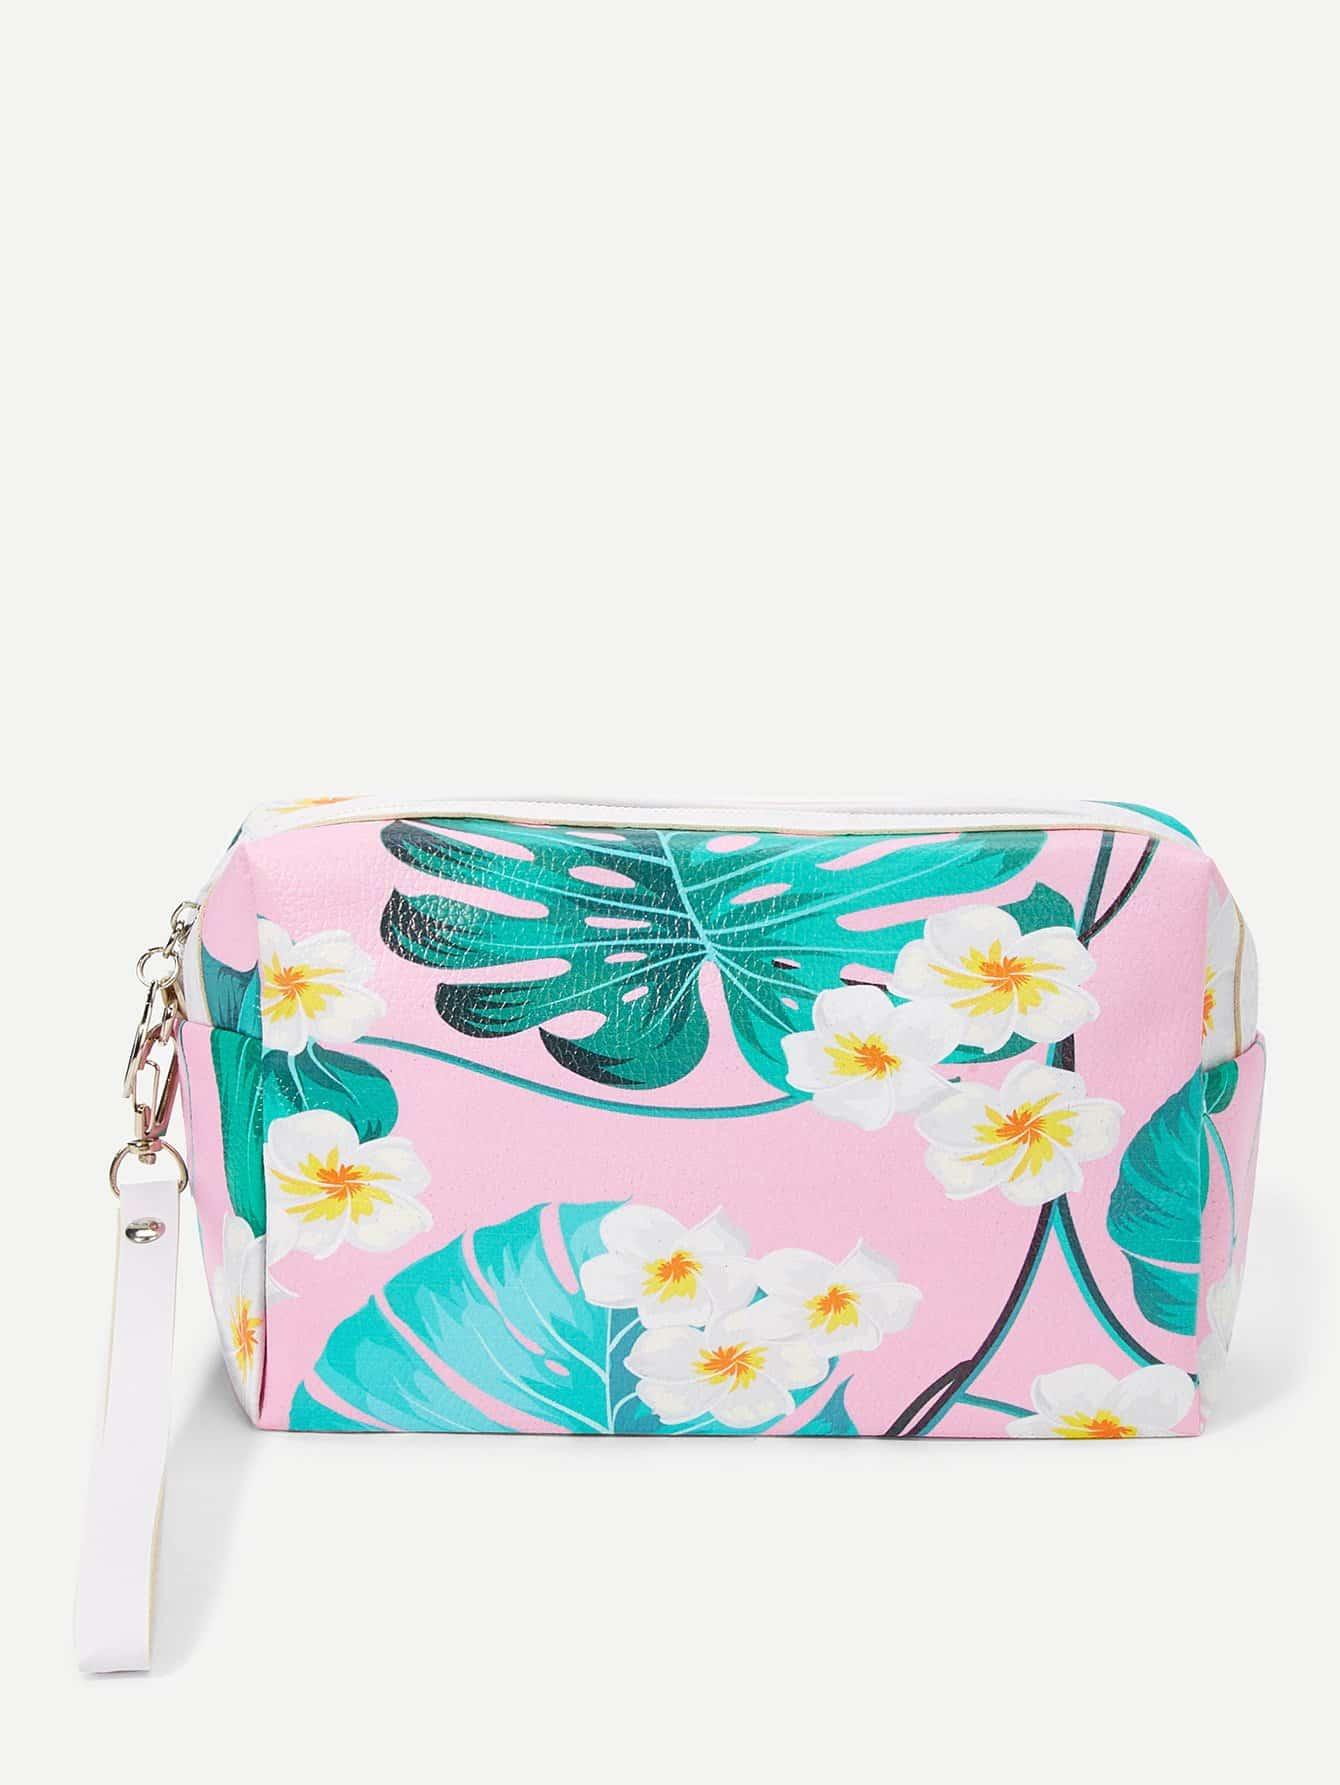 Flower Print Makeup Bag makeup organizer travel bag women cosmetic bags summer dumpling clutch women packages waterproof cosmetic bag handbag